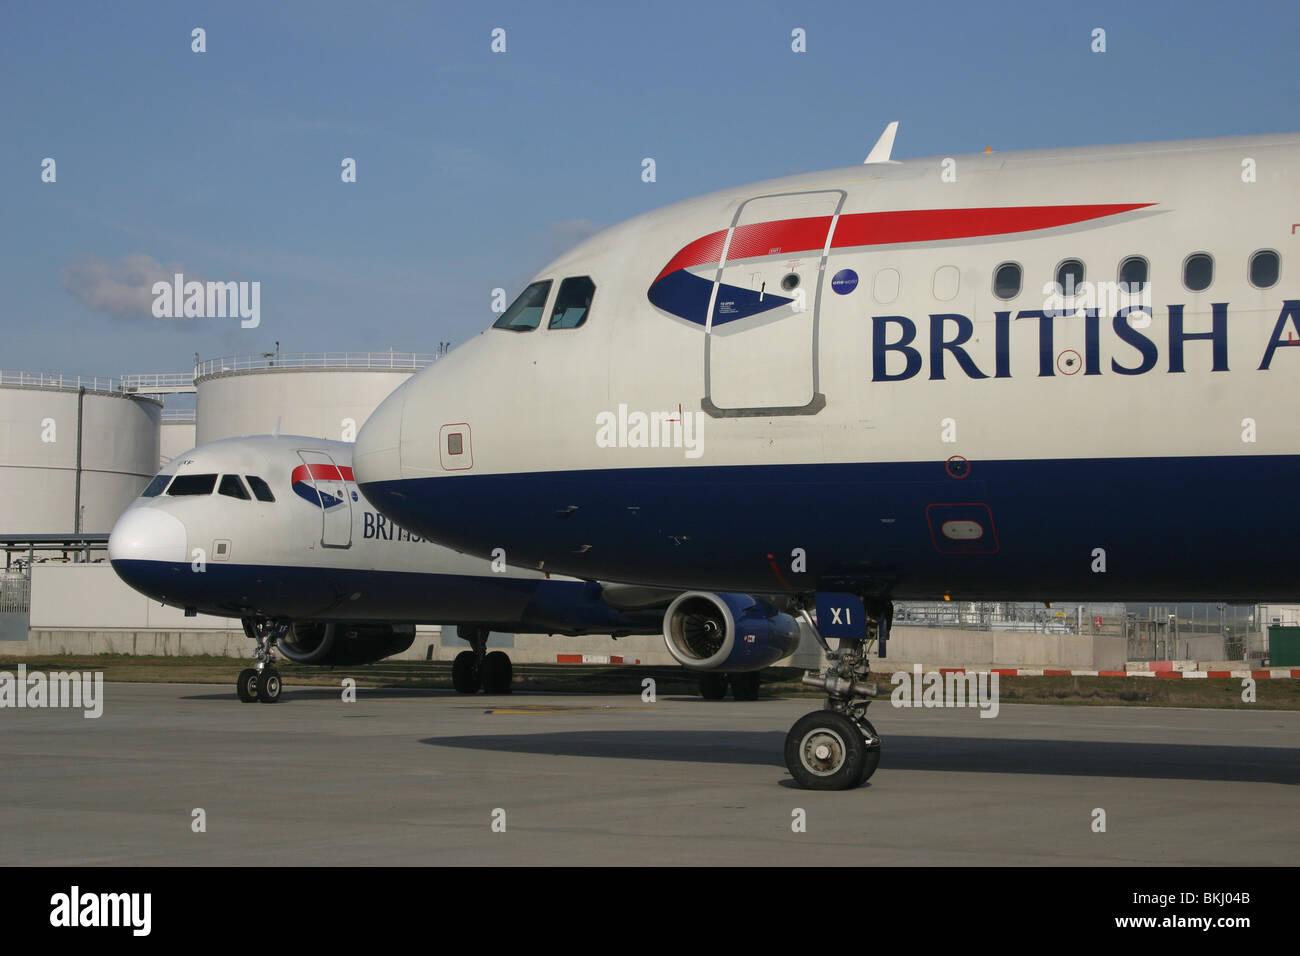 BA BRITISH AIRWAYS - Stock Image